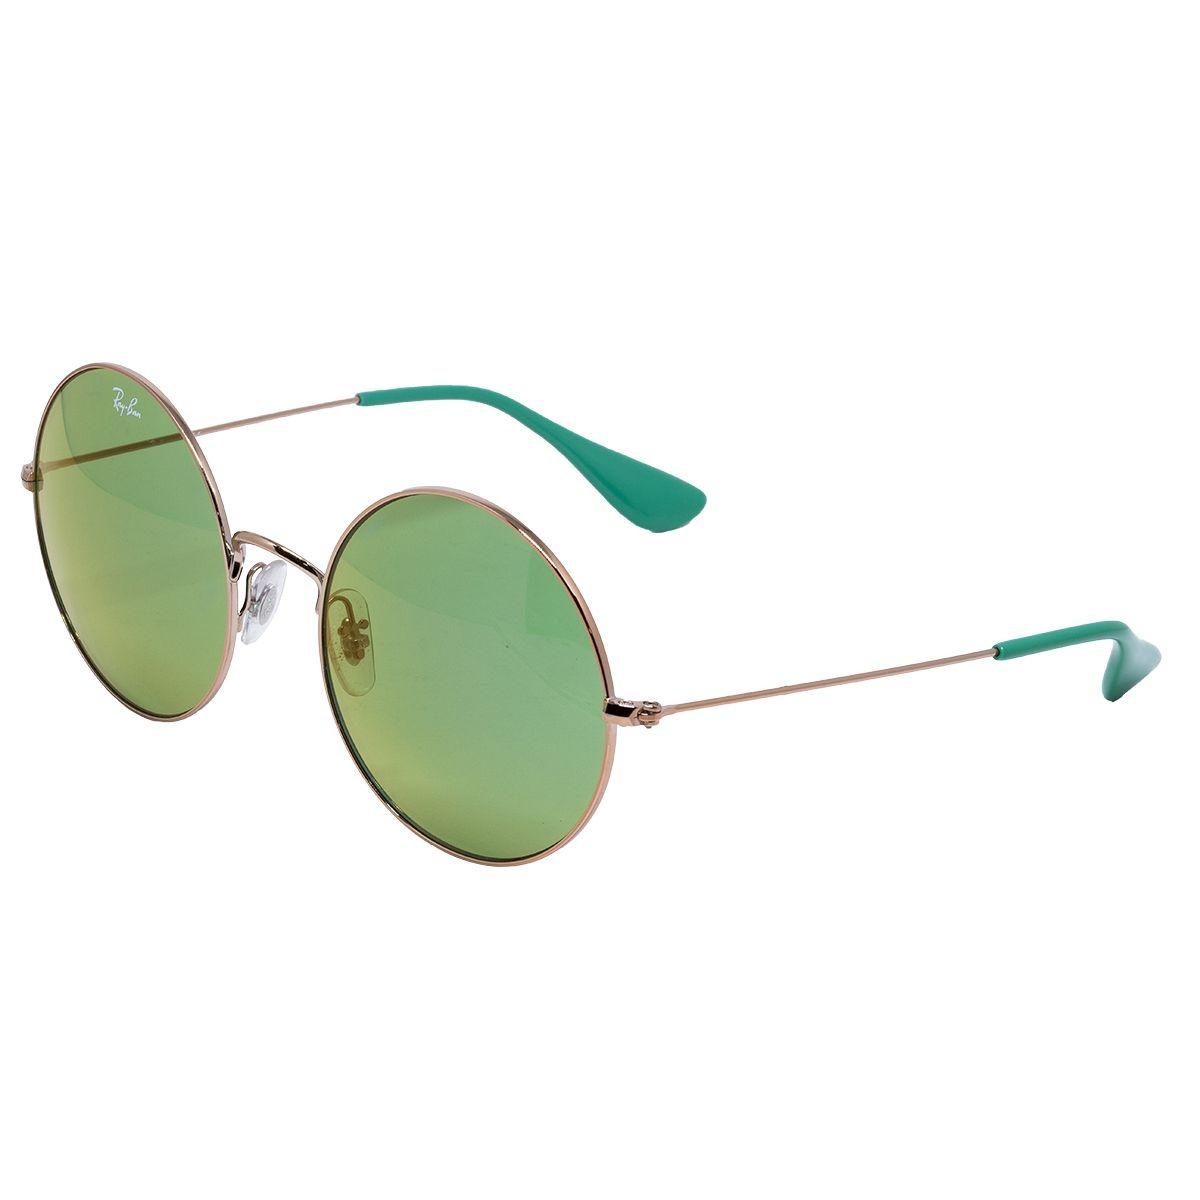 9123315b697 Óculos De Sol Ray Ban Original Ja-jo Shine Copper Rb3592 - R  497